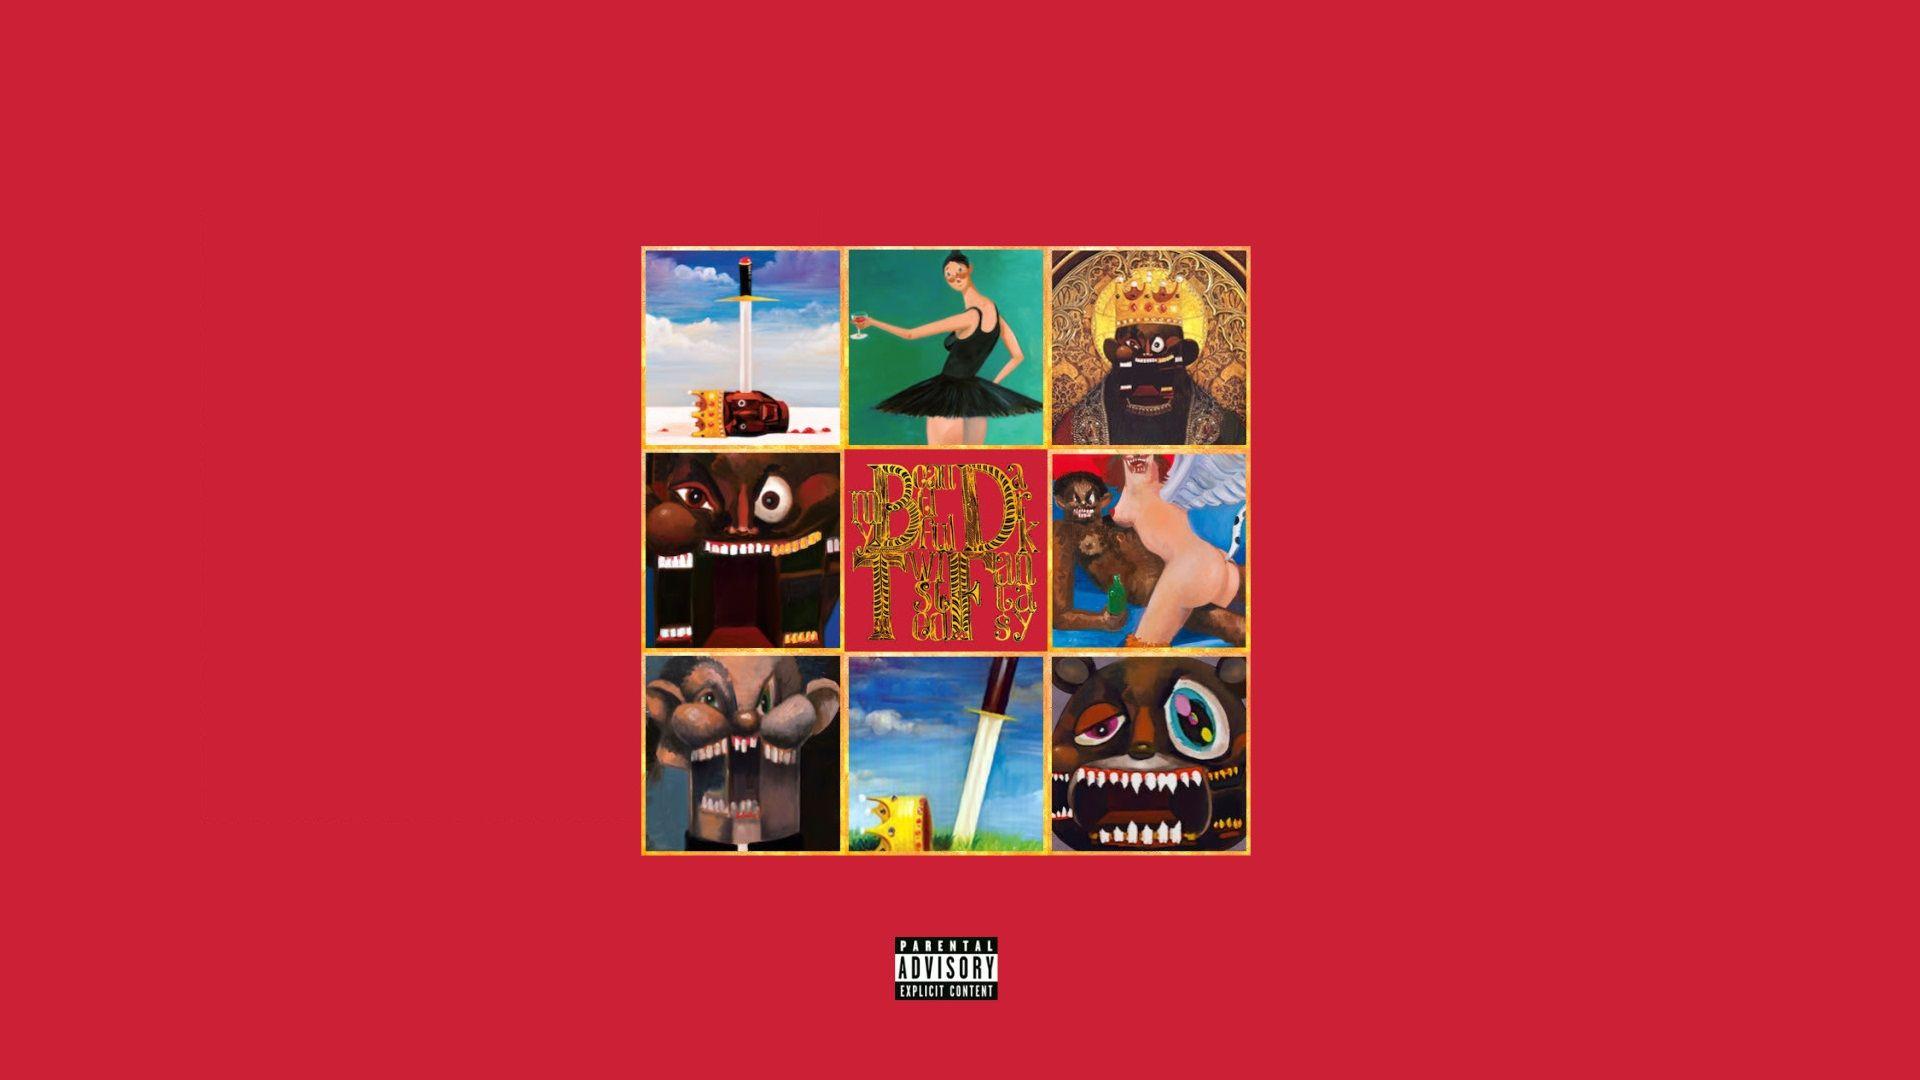 En 2010, Kanye West sortait : My Dark Twisted Fantasy